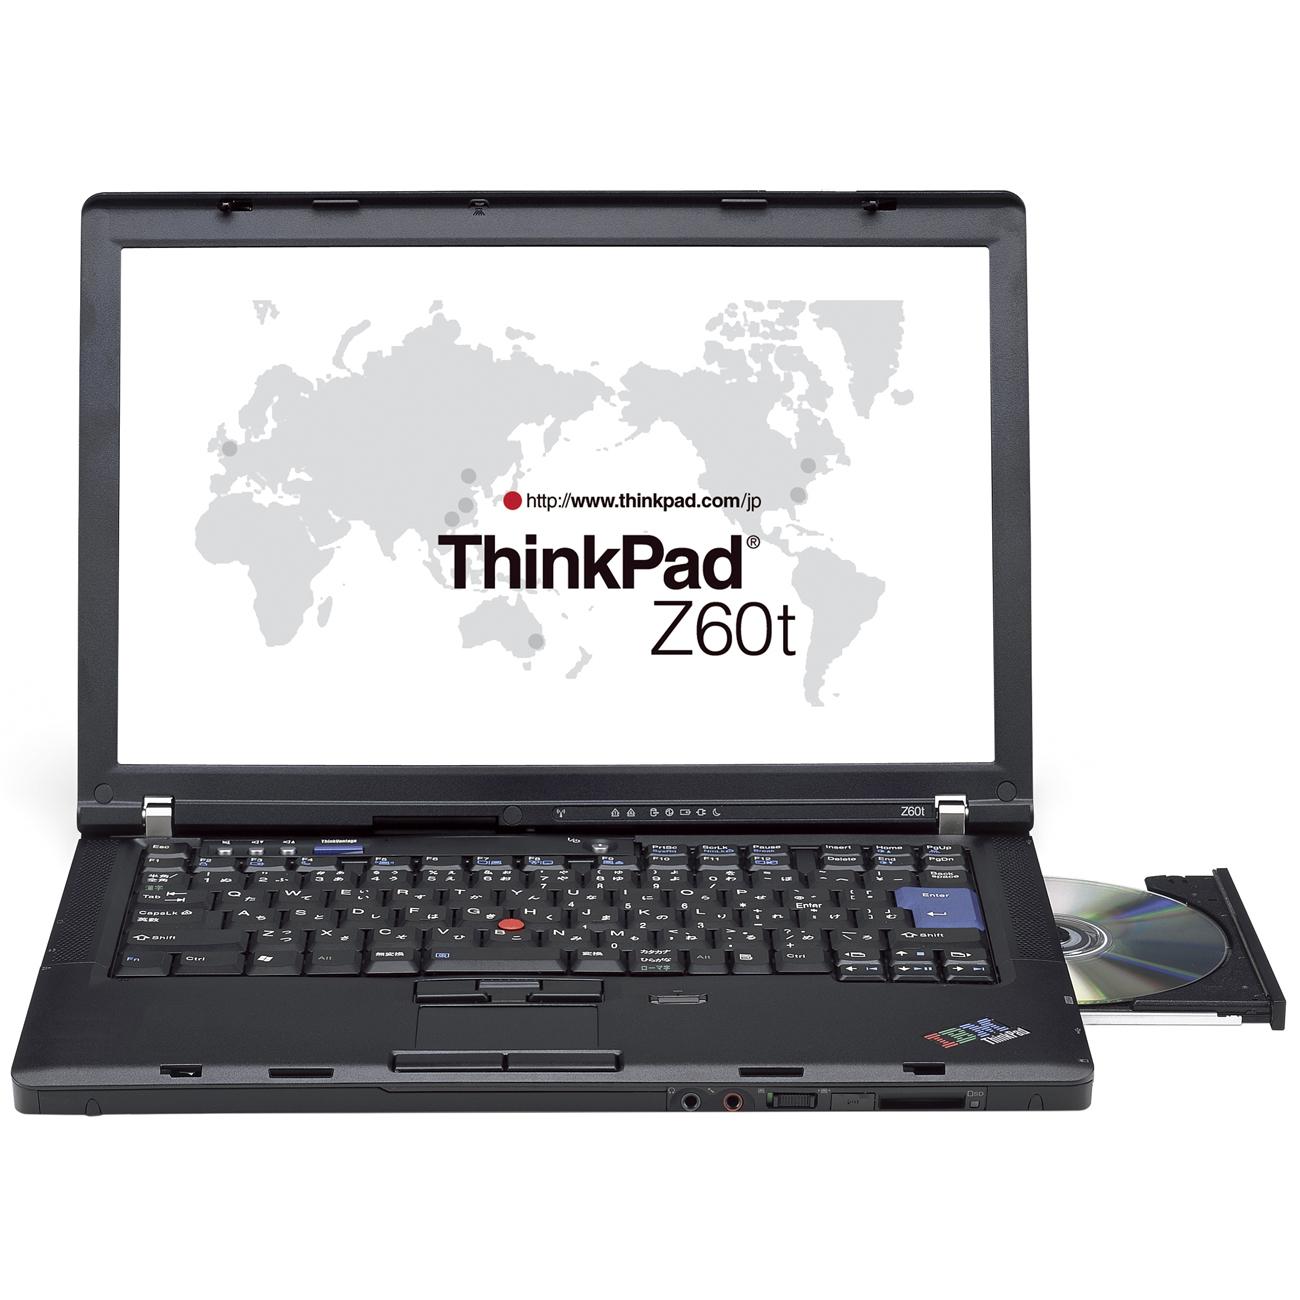 IBM ThinkPad Z60m/Z60t Audio 5.10.1.4230 driver description